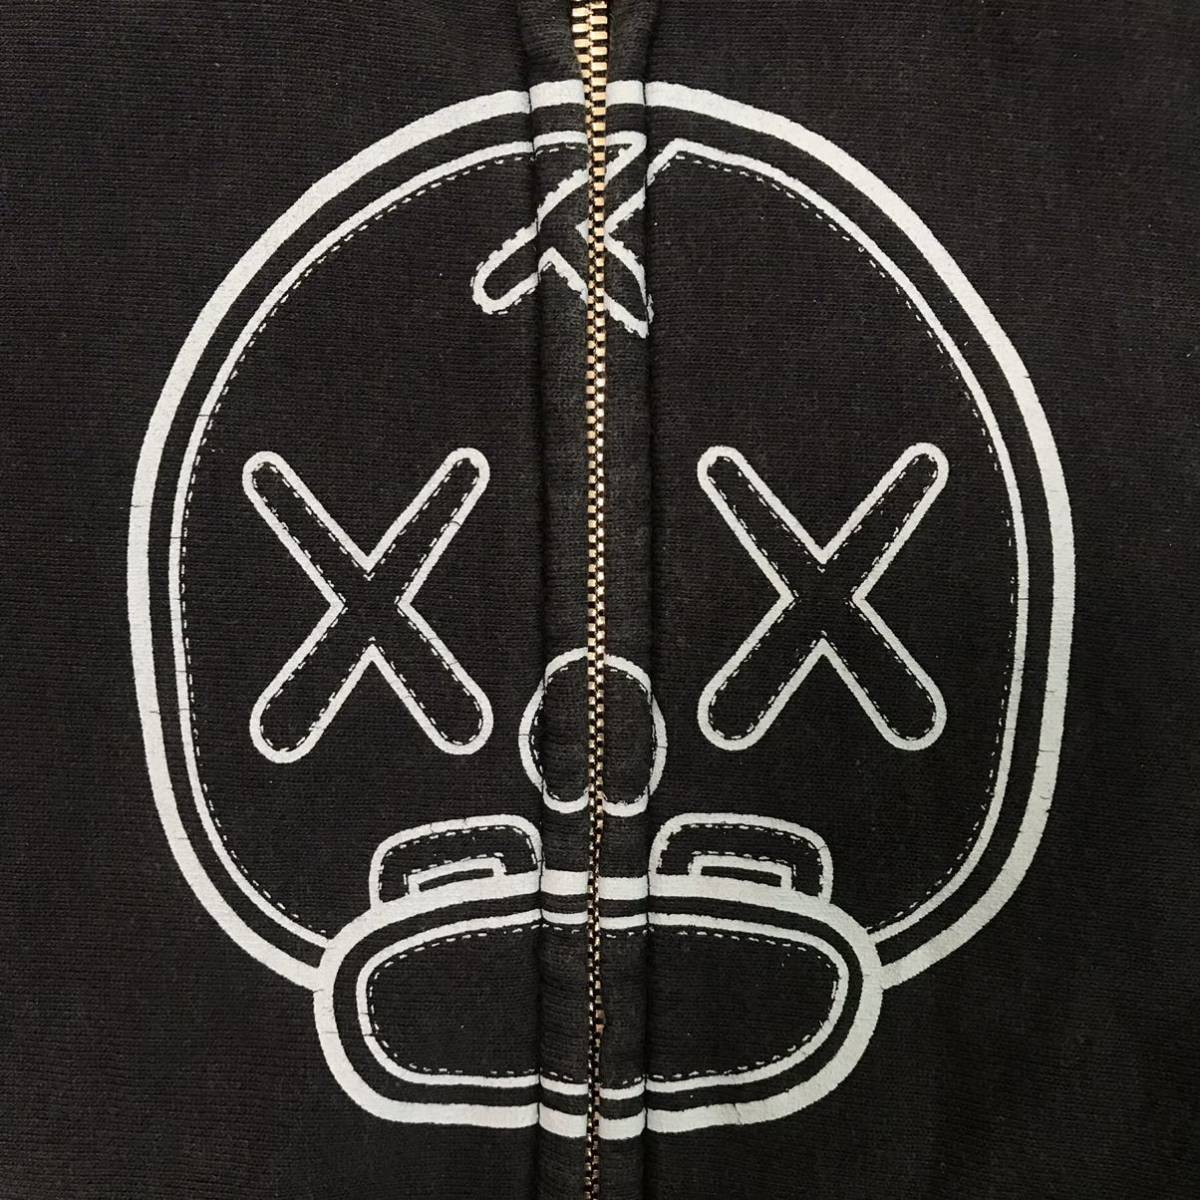 kaws × BAPE パーカー KIDS 110サイズ カウズ a bathing ape milo zip hoodie エイプ ベイプ アベイシングエイプ キッズ navy